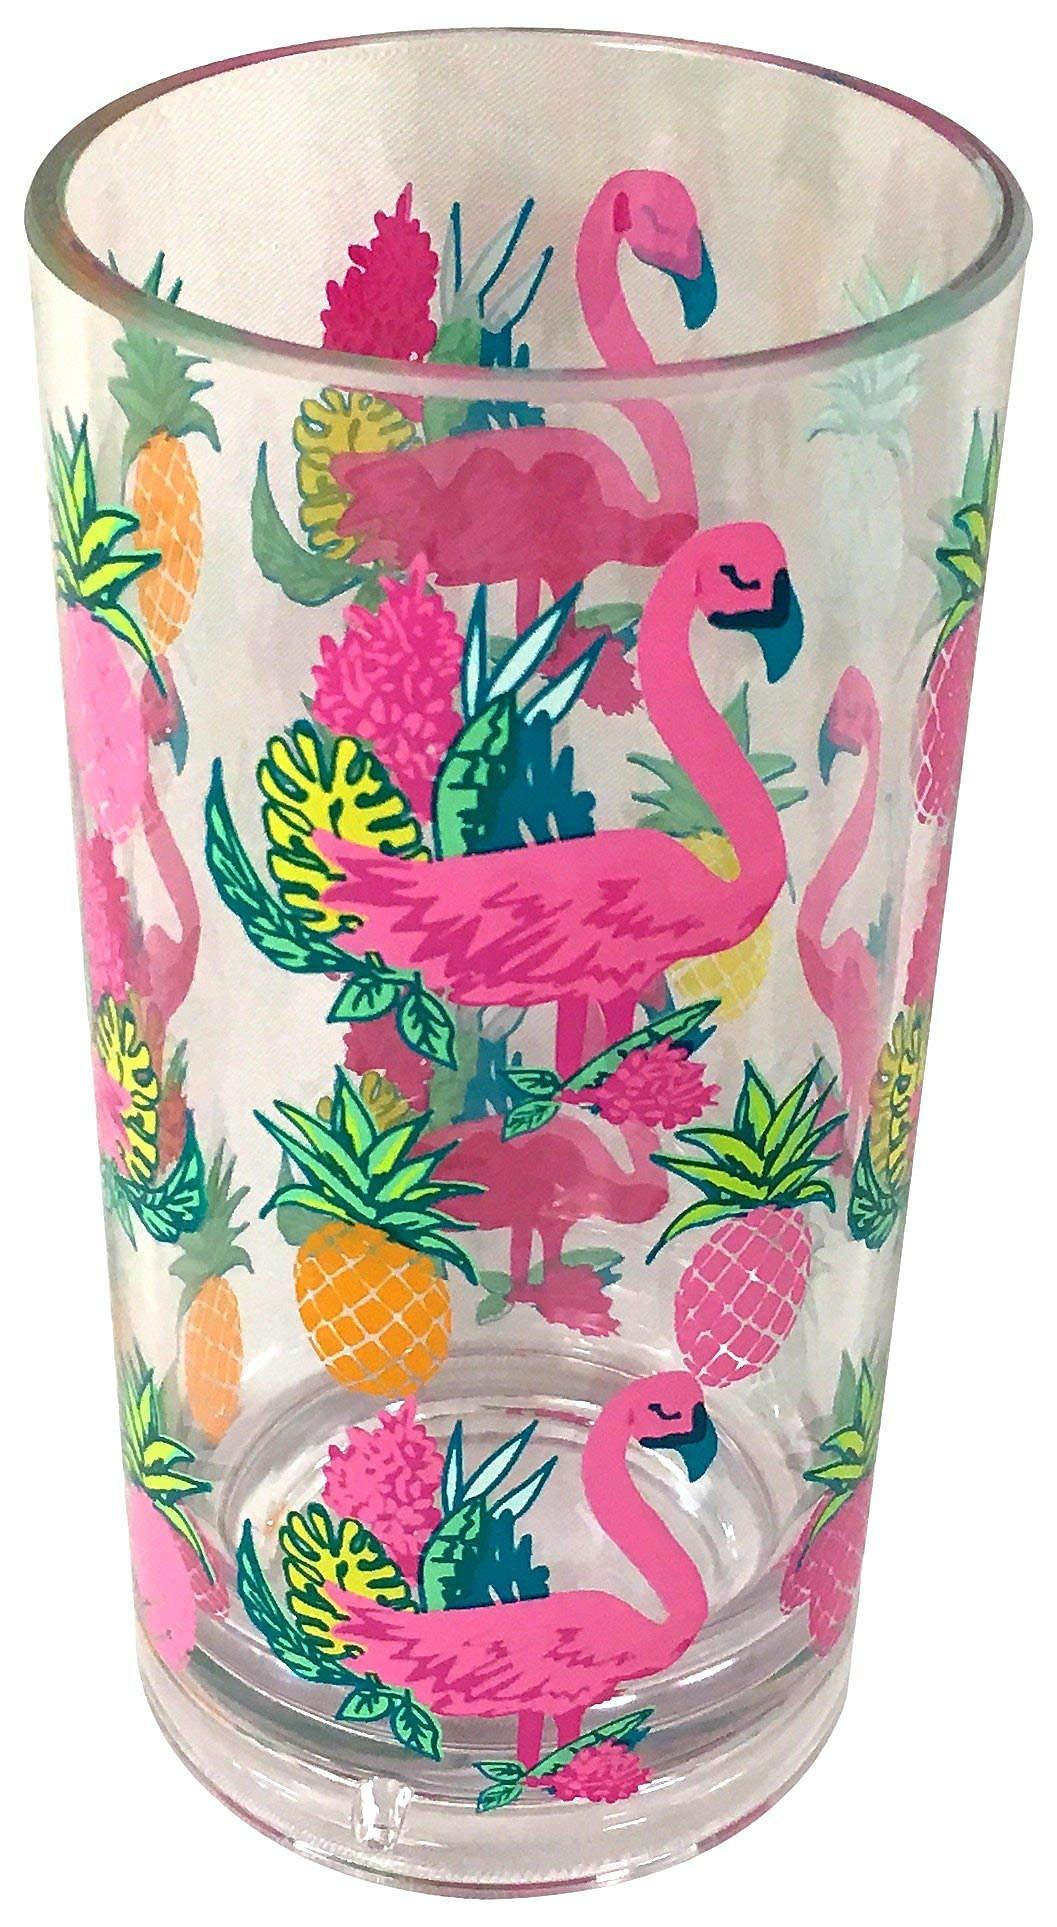 Tropix 19 oz. Pineapple Flamingo Highball Glass One Size Pink/yellow/green